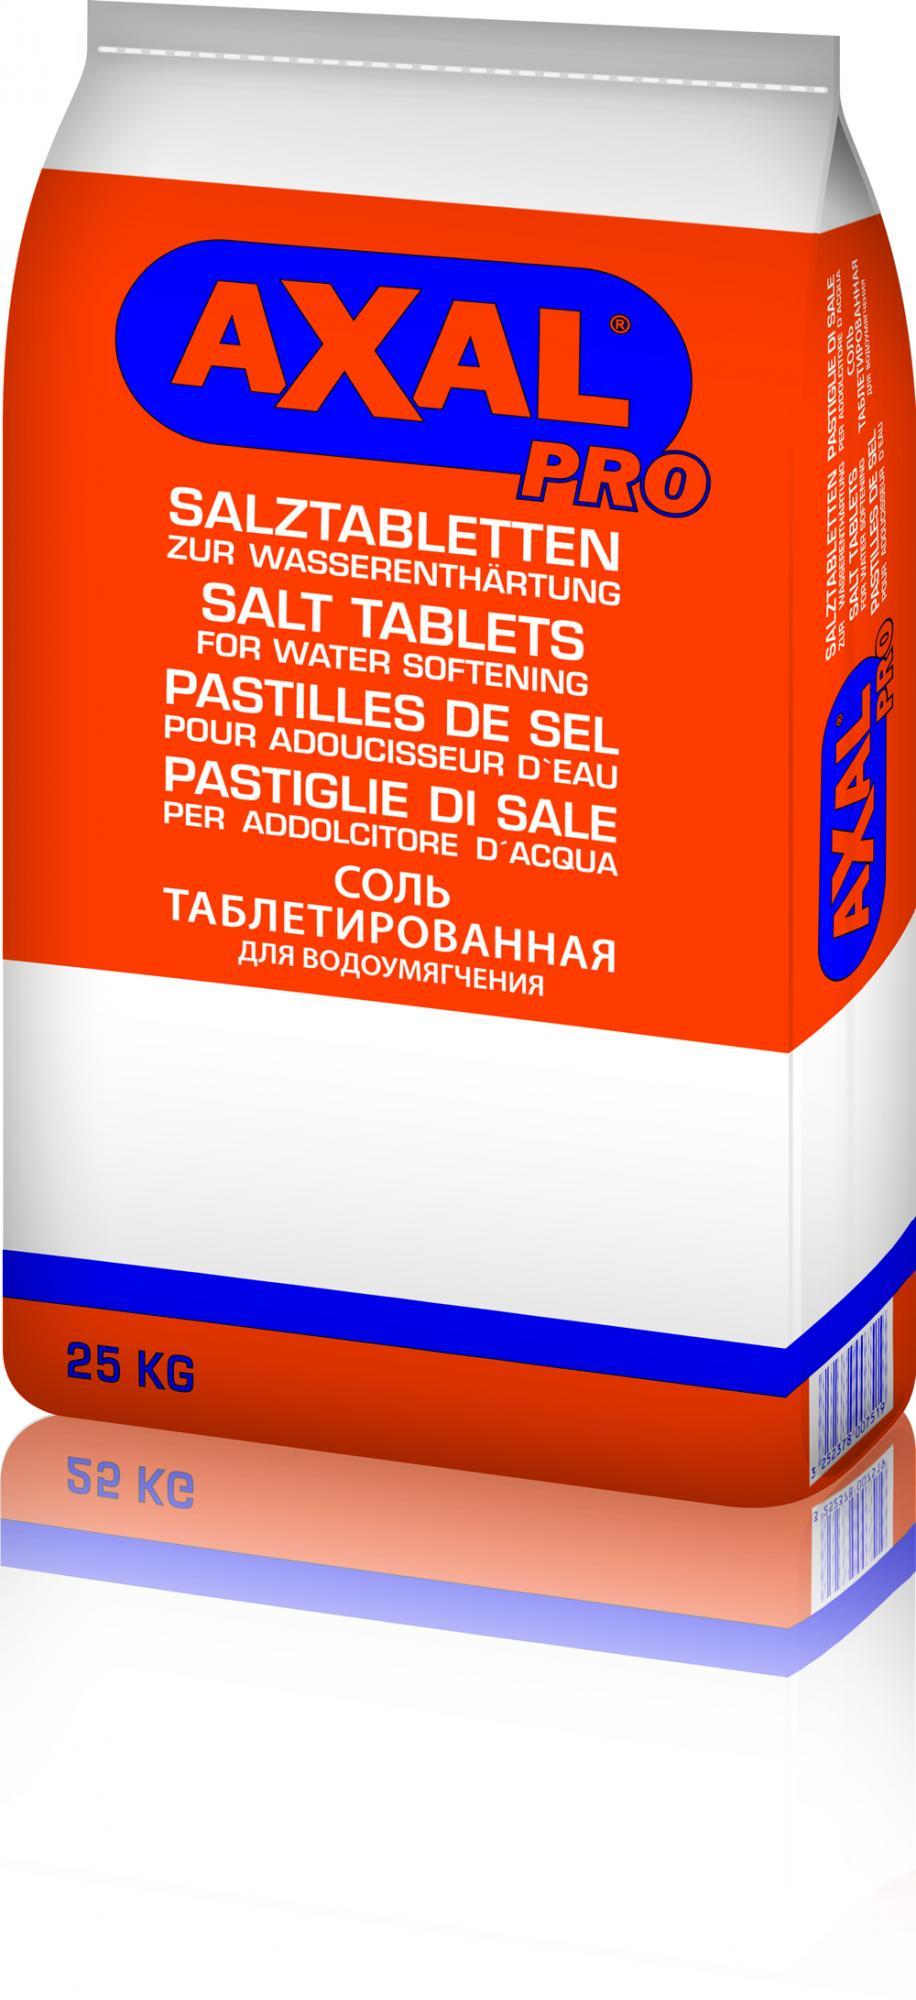 Salt Tablets - Water Softening